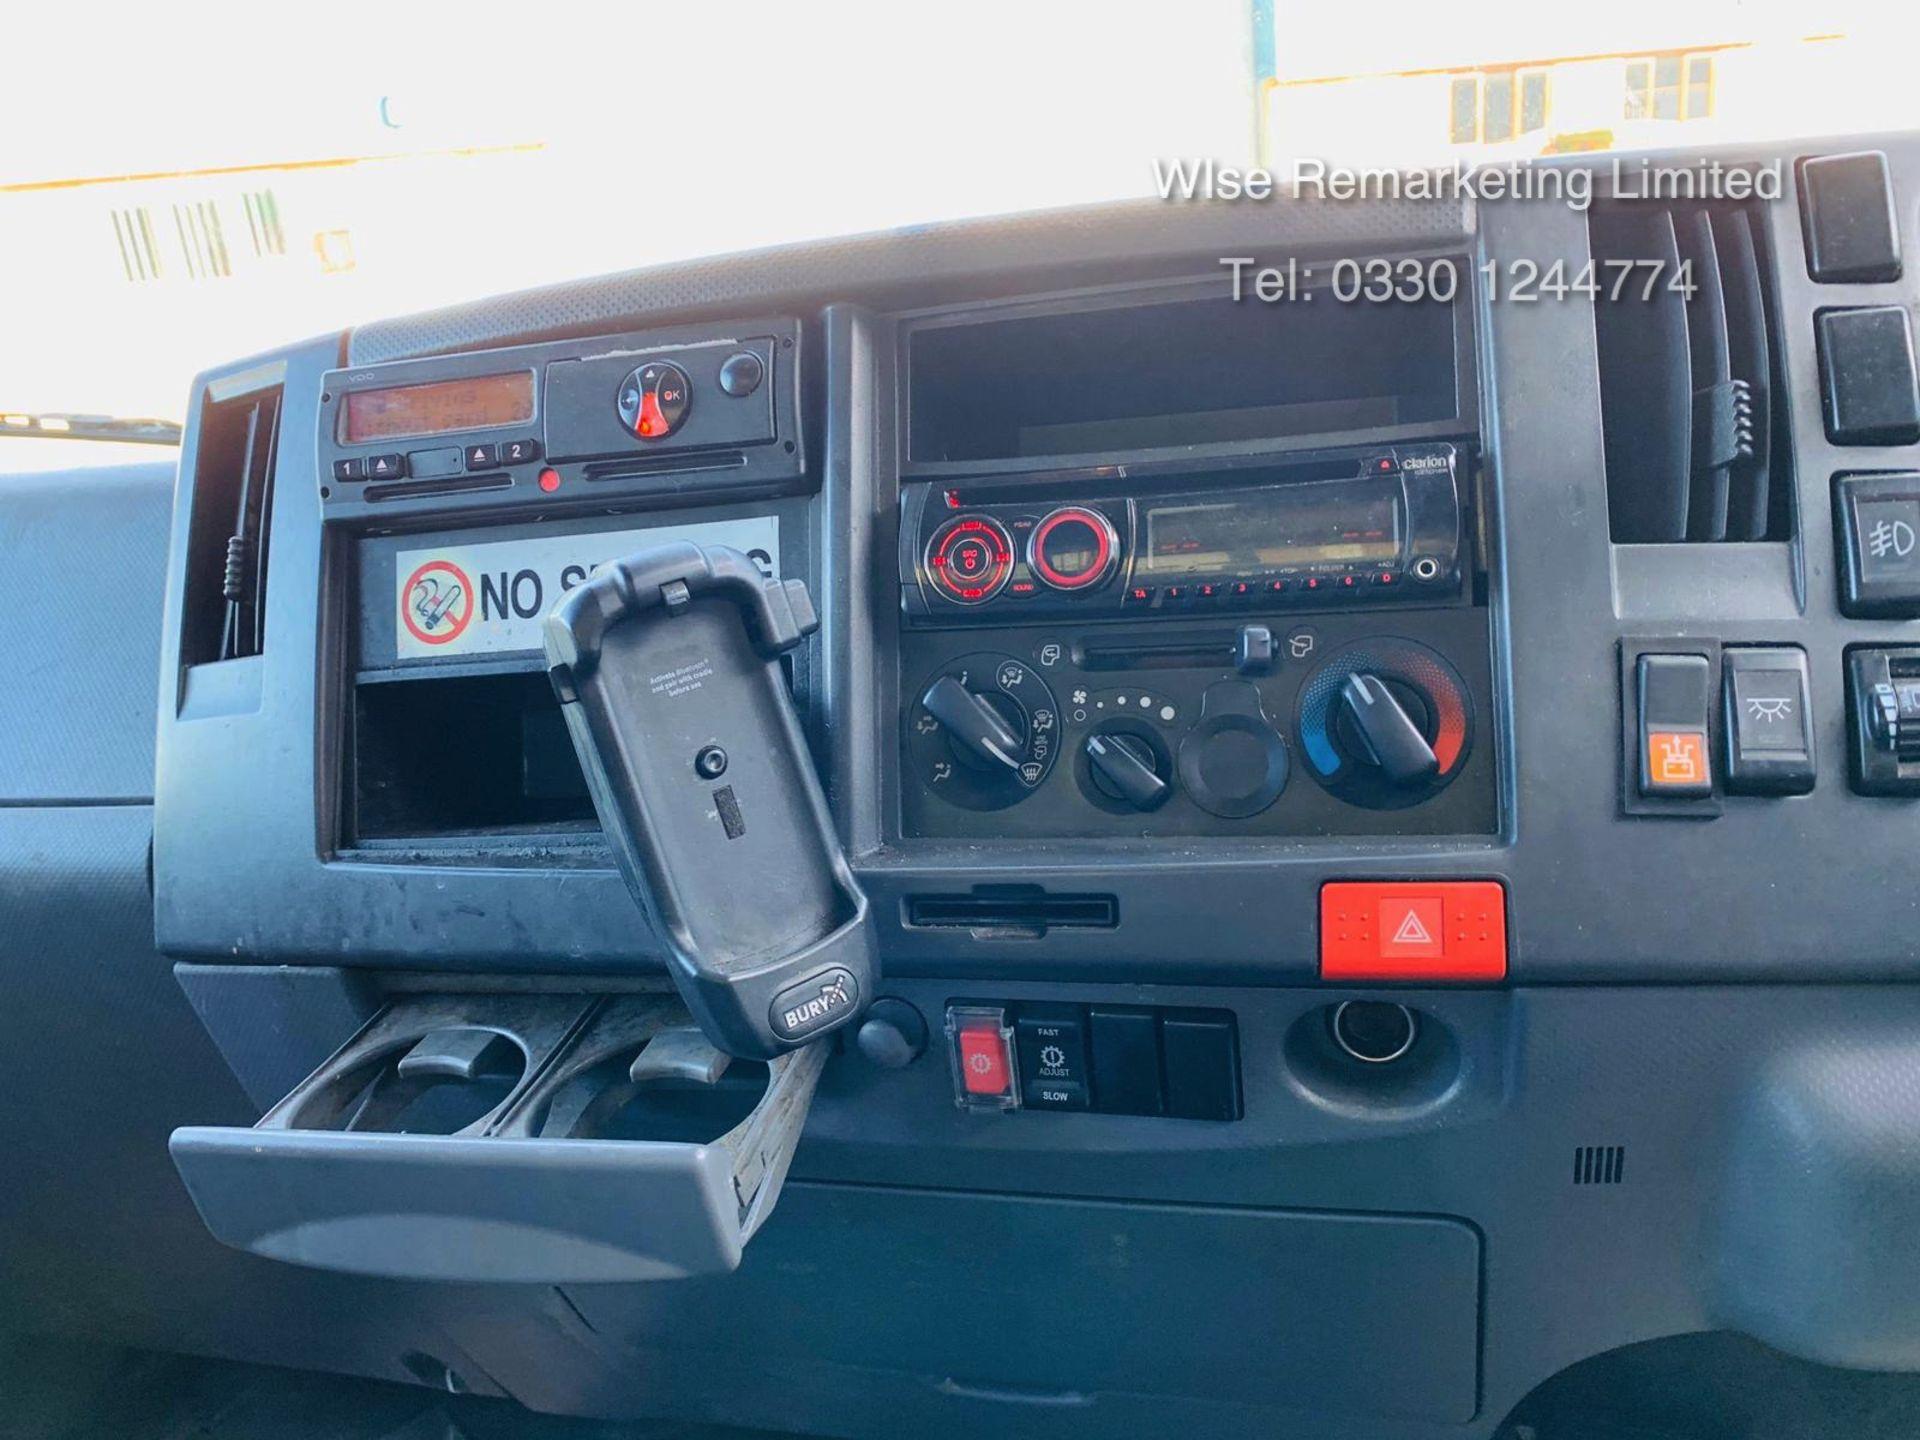 Lot 8 - (RESERVE MET) Isuzu N75.190 NPR Automatic 16ft Curtainsider - 2013 Model - 1 Owner - Long MOT